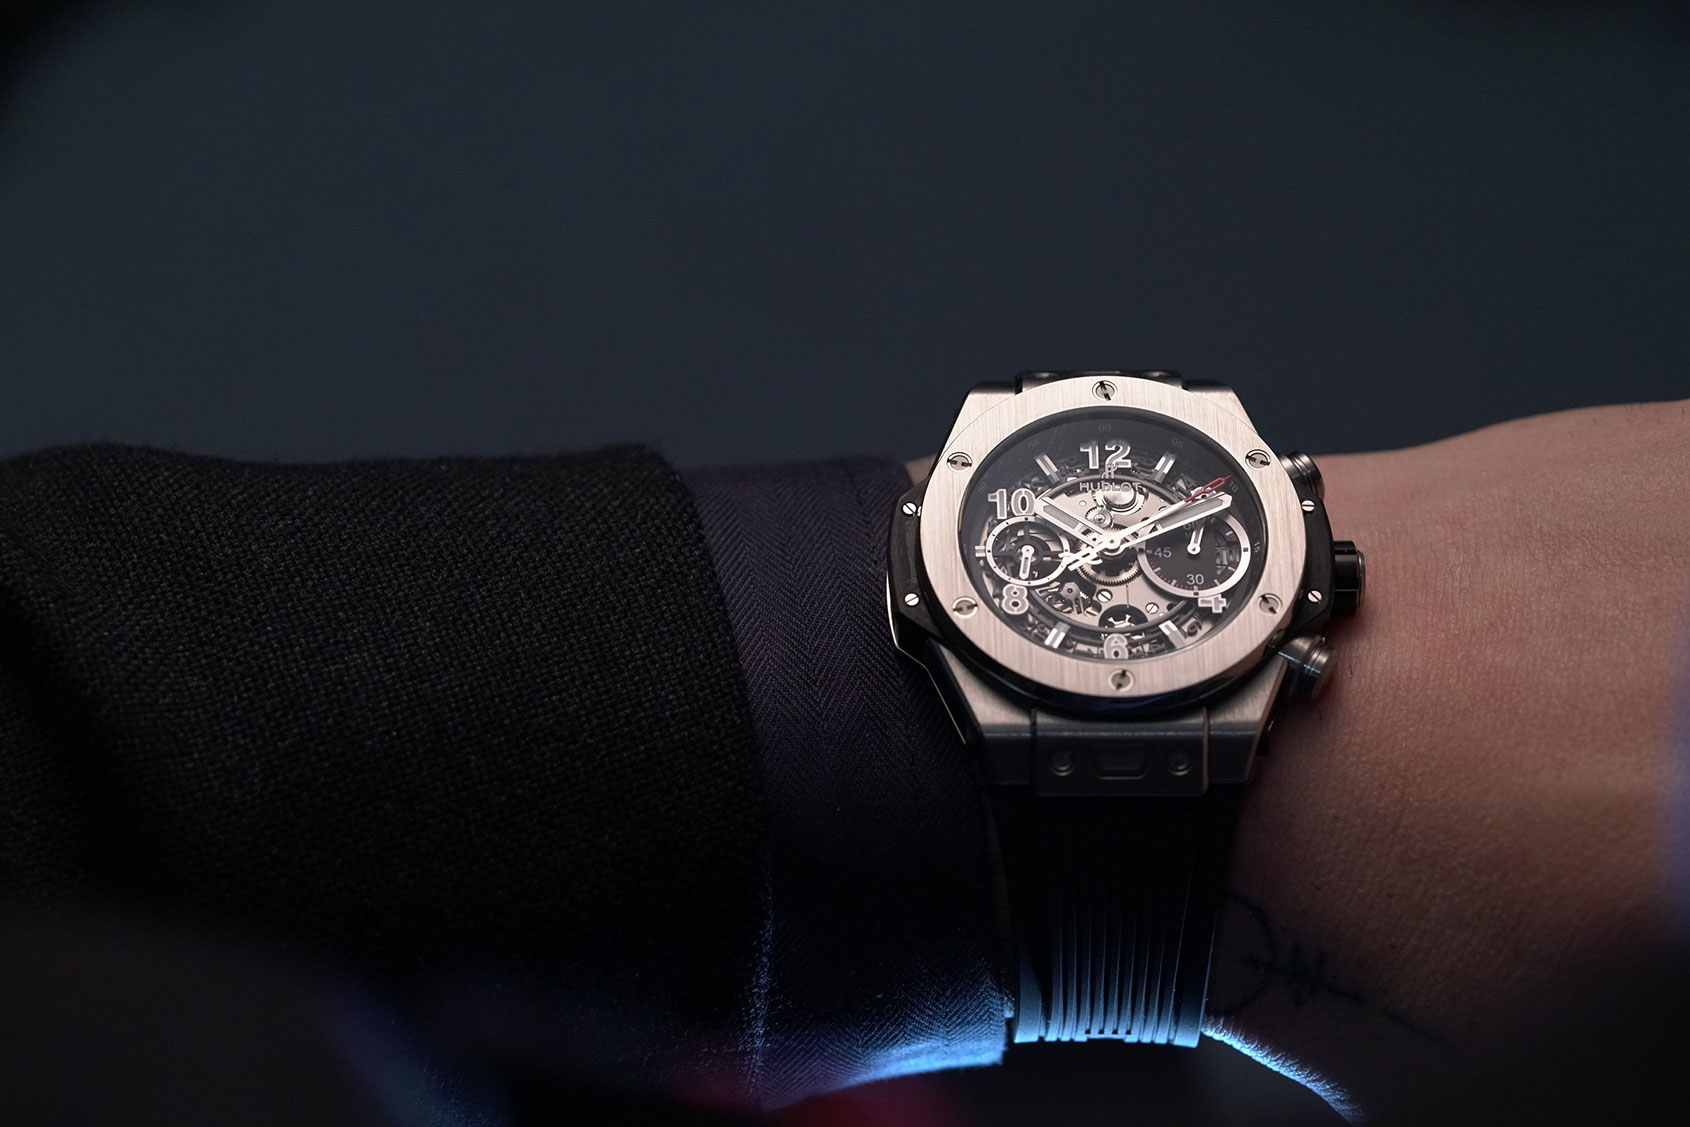 Hands On The Hublot Big Bang Unico Titanium Chronograph